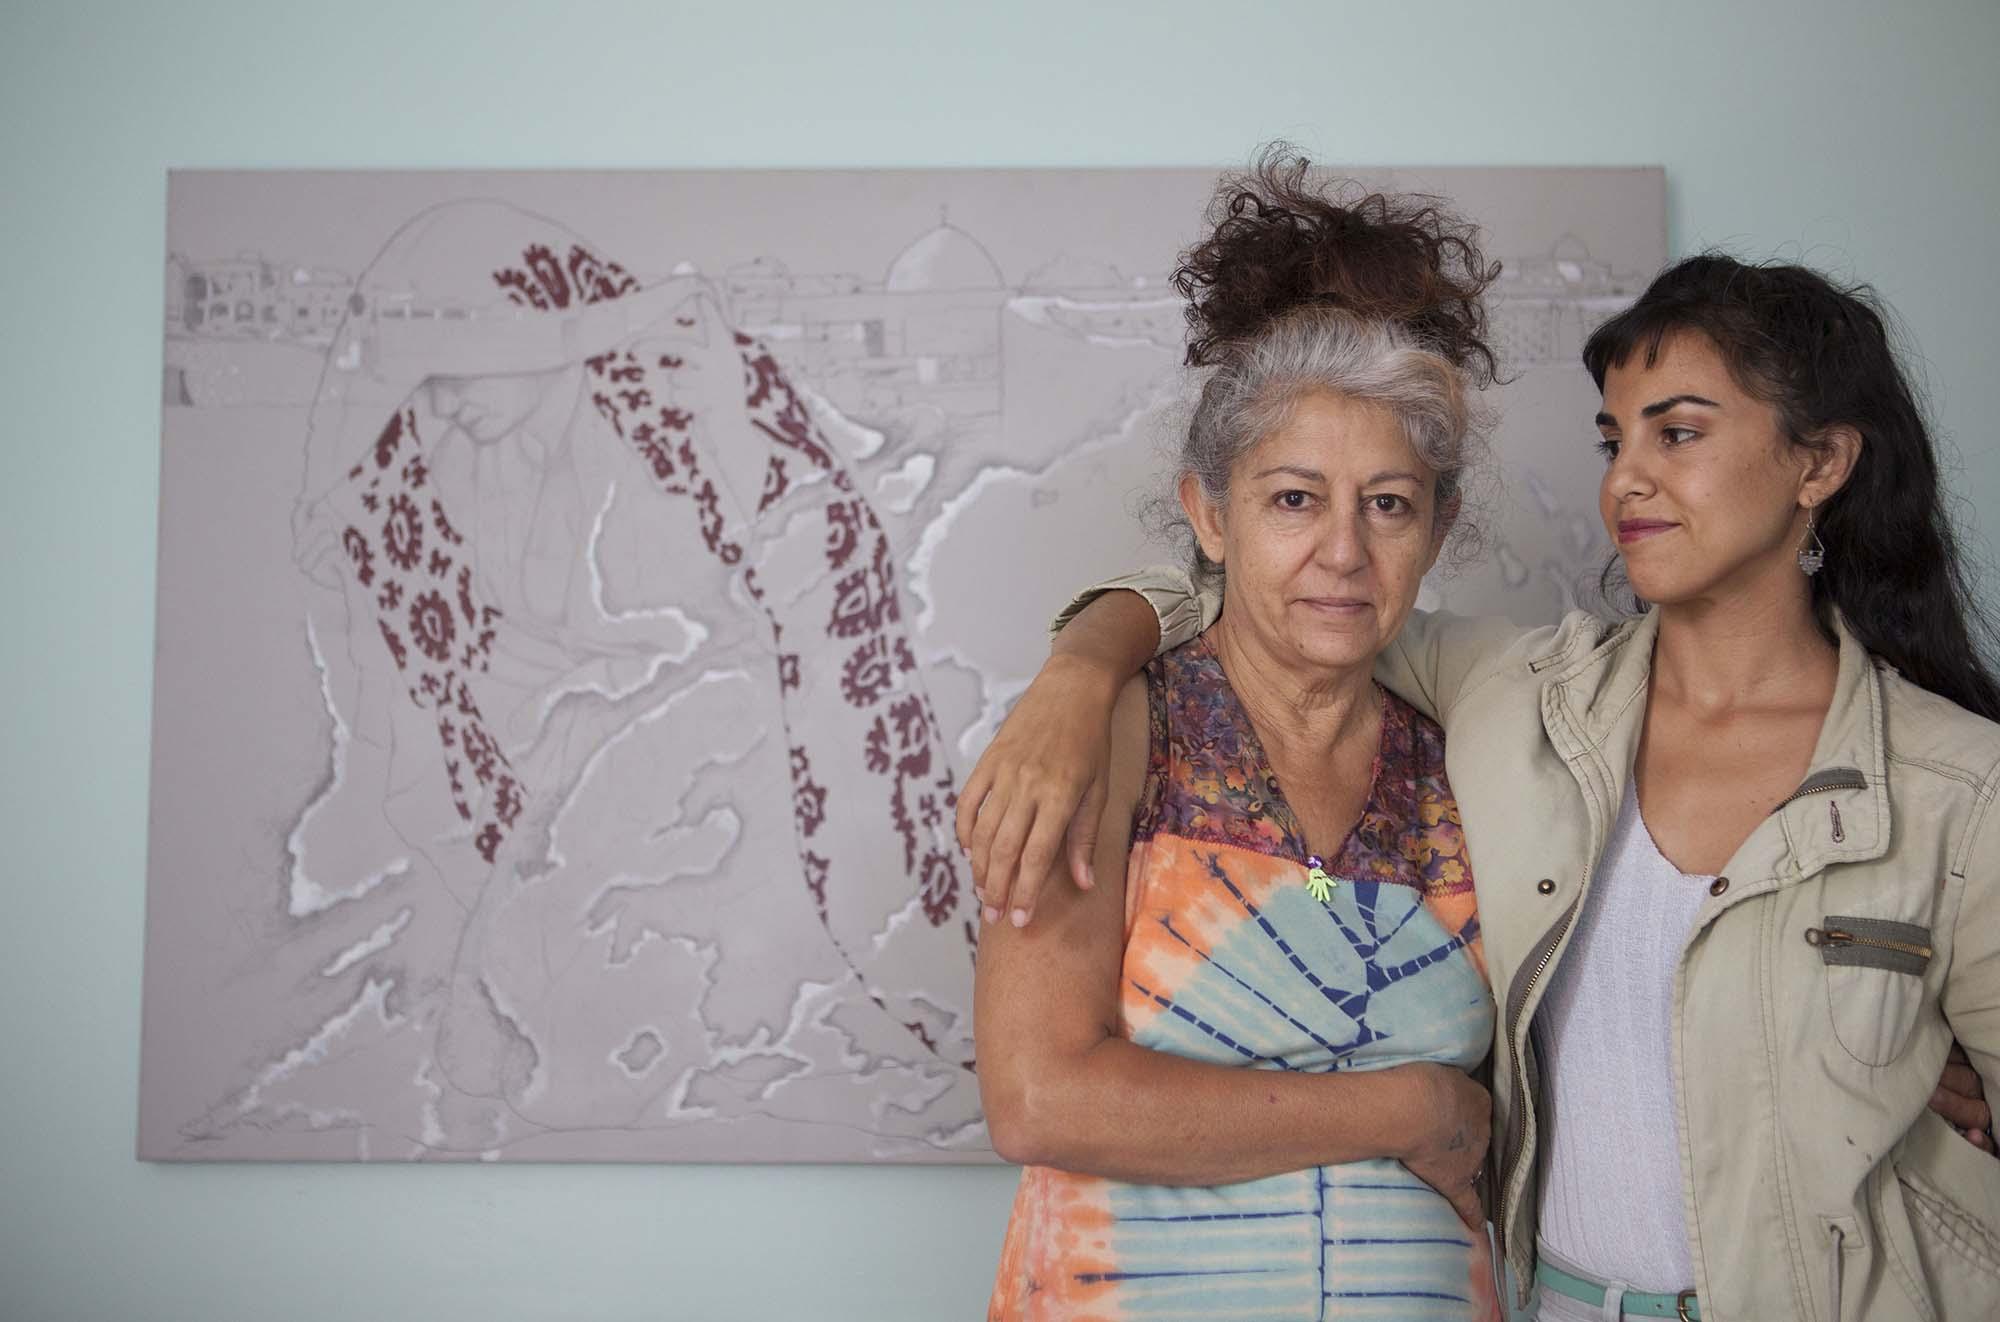 Lahib Jaddo and Nadia Shihab